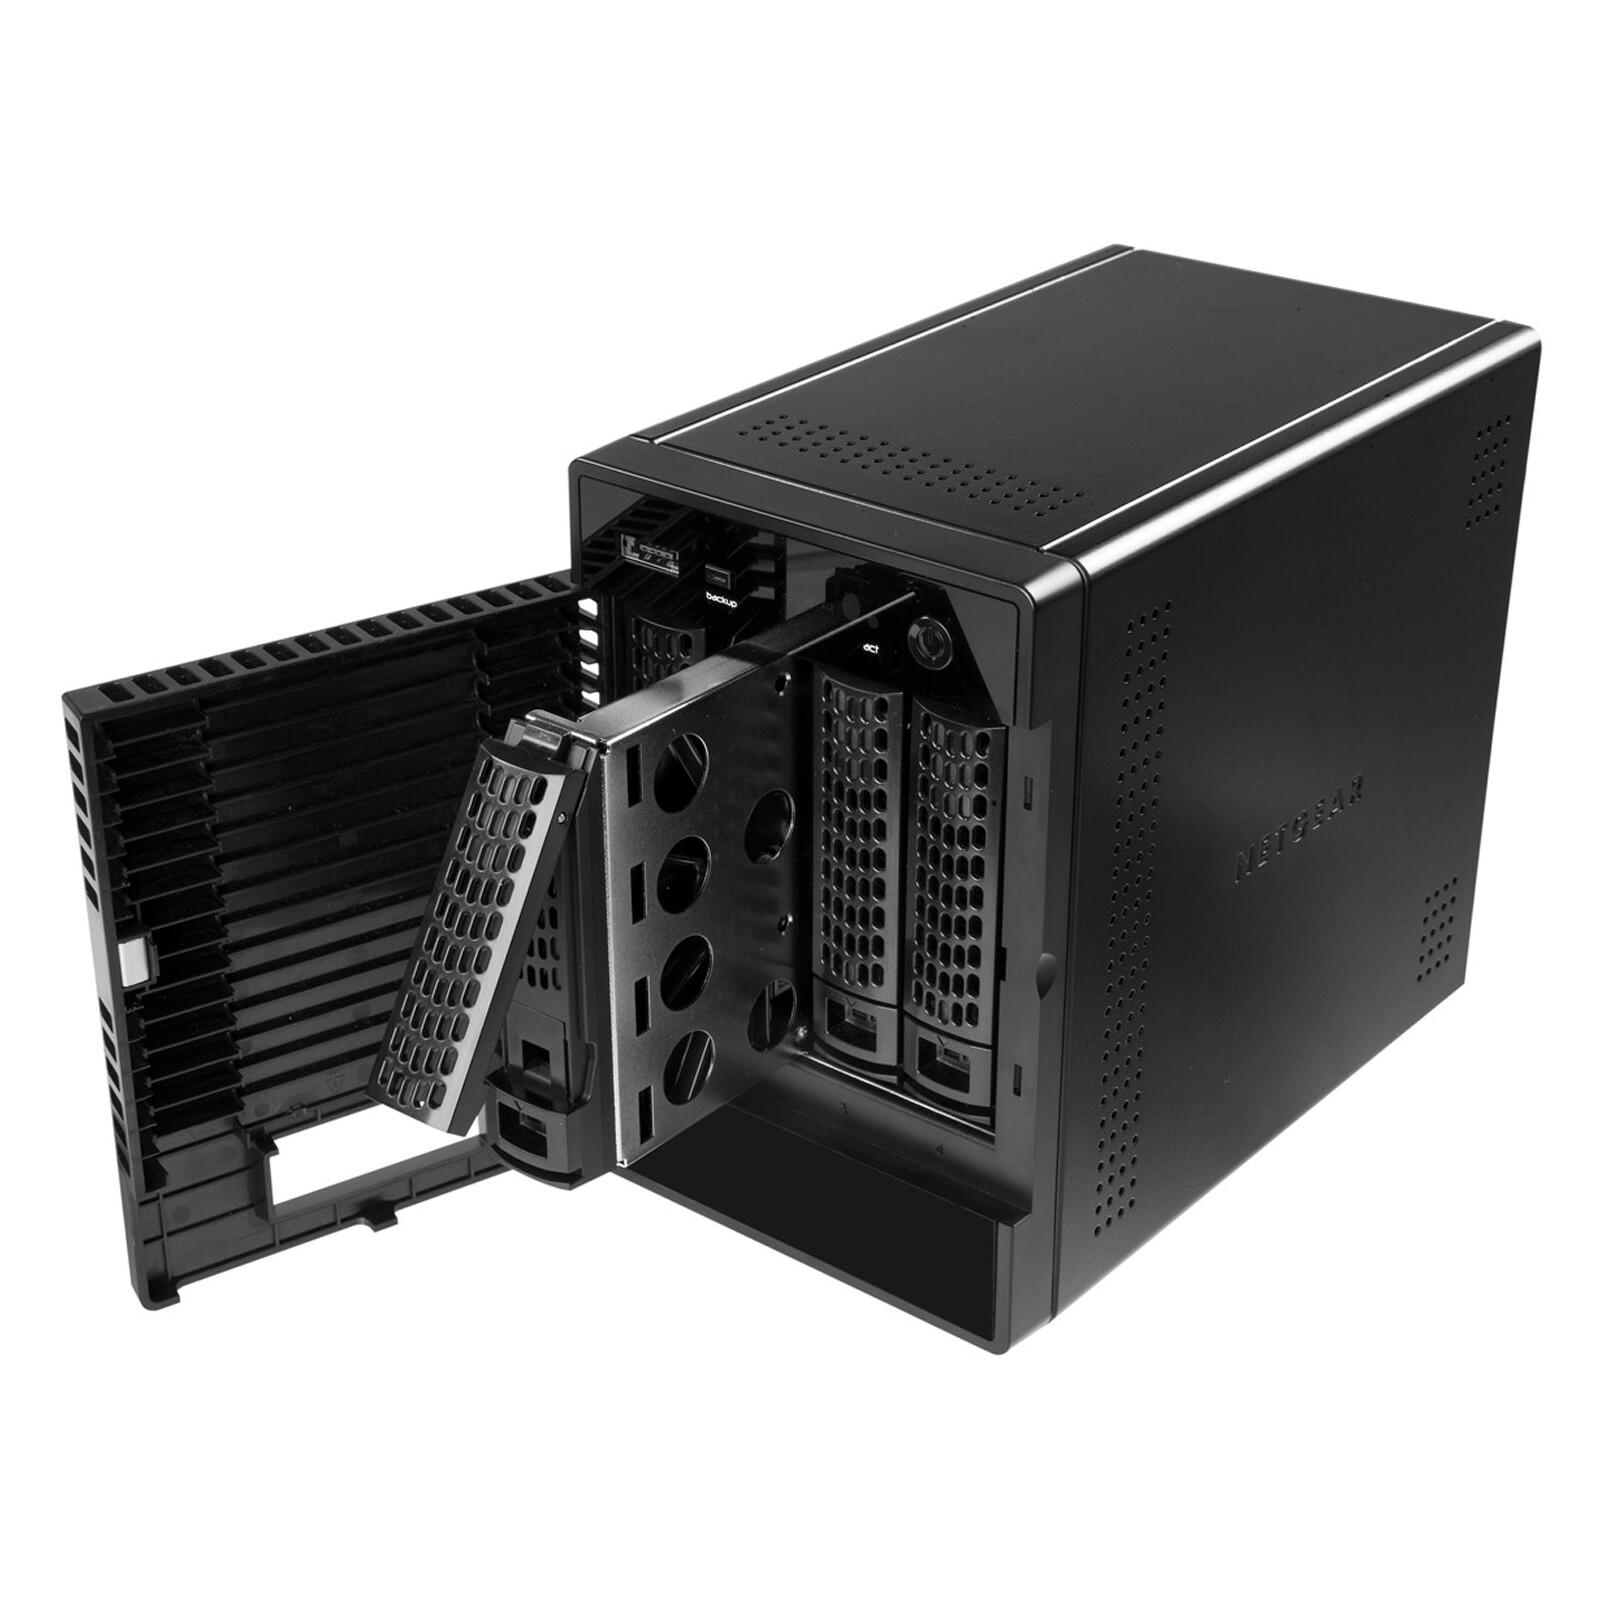 Netgear Ready Nas 214 4x2TB